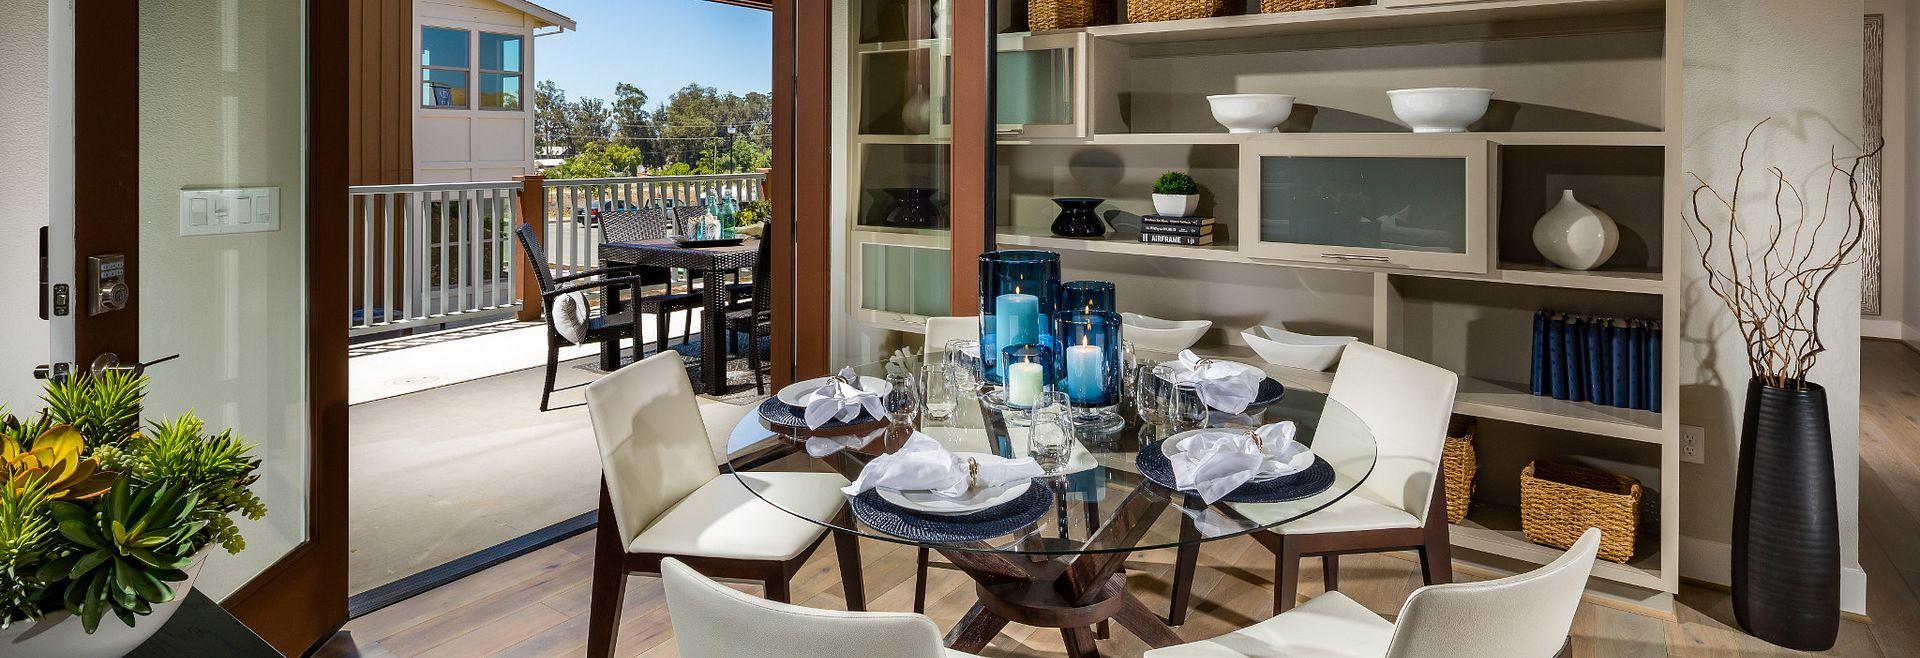 Harmony Sage Livermore Plan 3 Dining Room